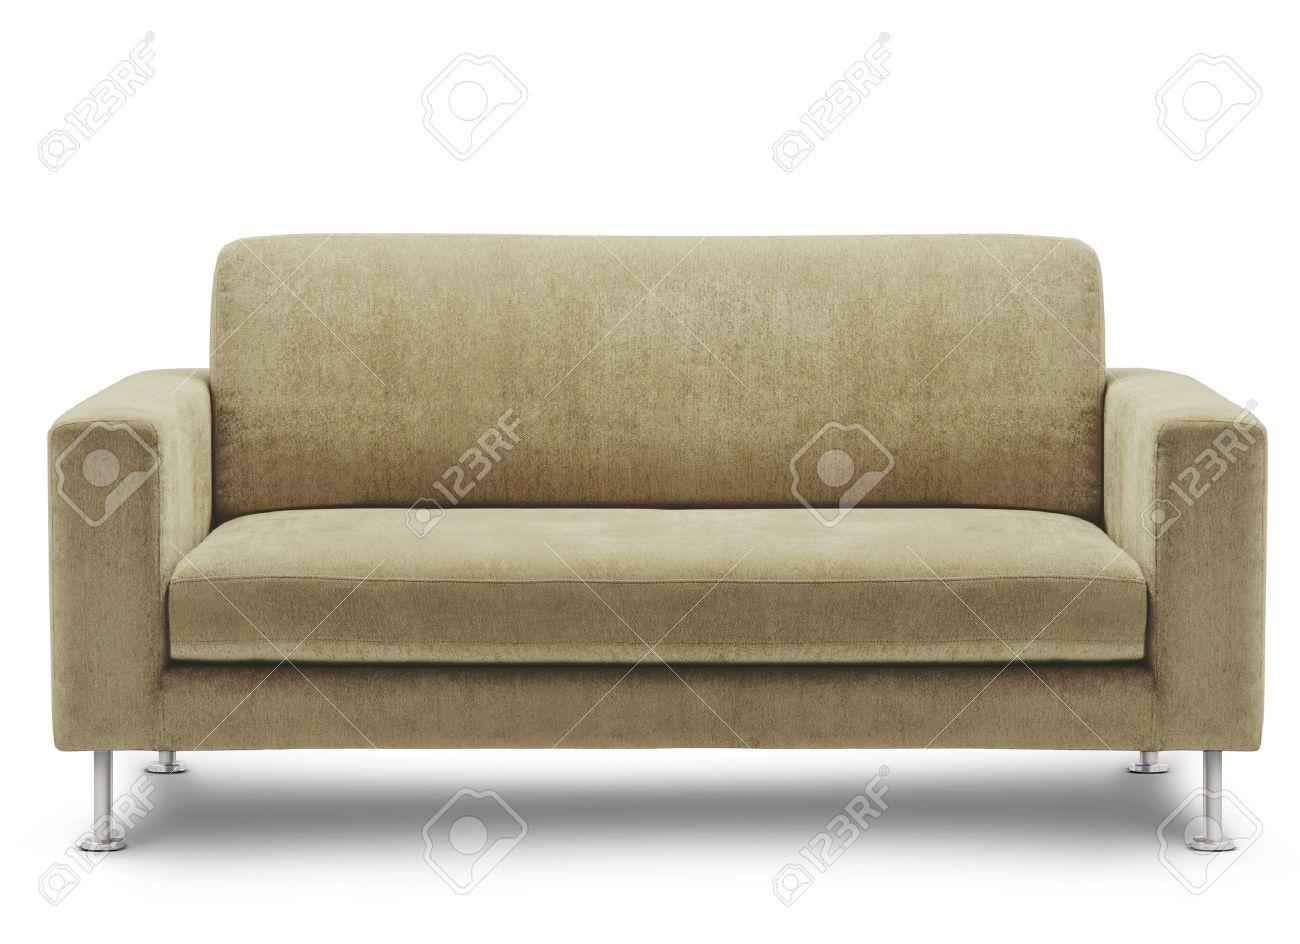 sofa furniture isolated on white background Stock Photo - 12320749